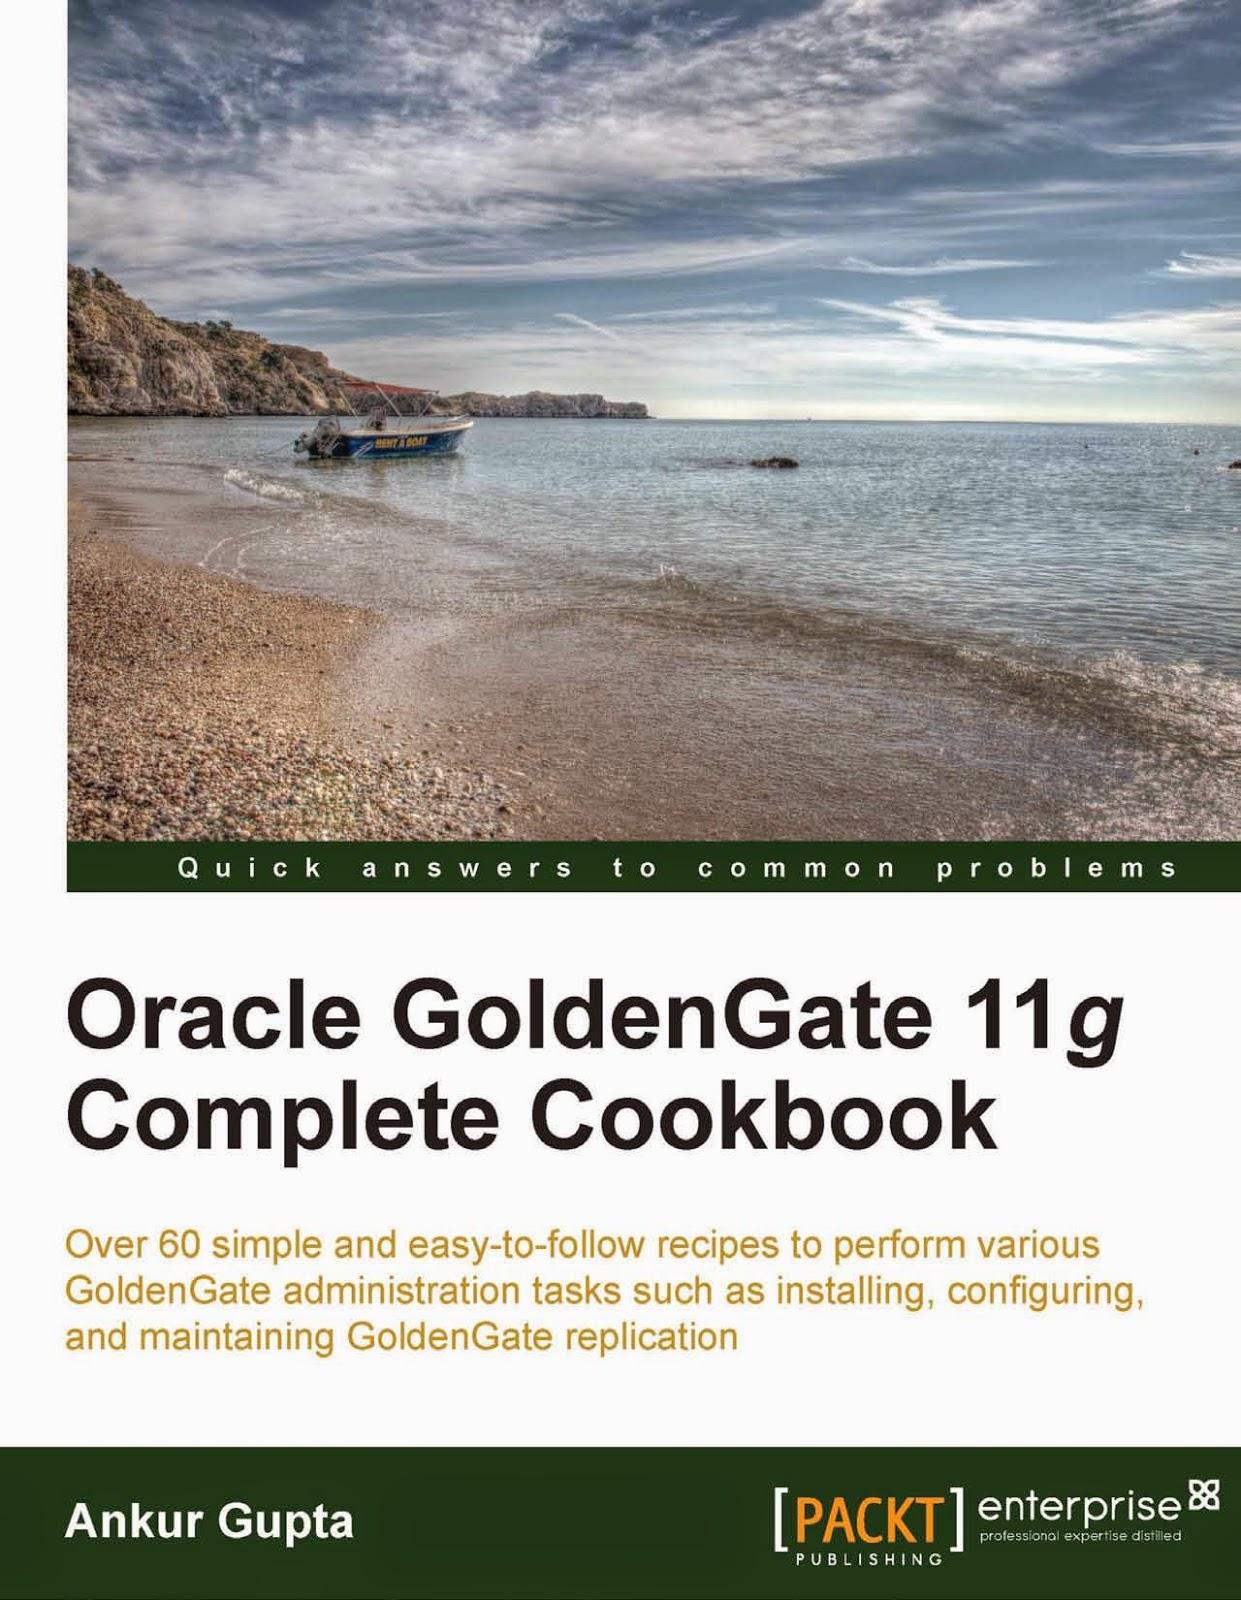 http://kingcheapebook.blogspot.com/2014/07/oracle-goldengate-11g-complete-cookbook.html